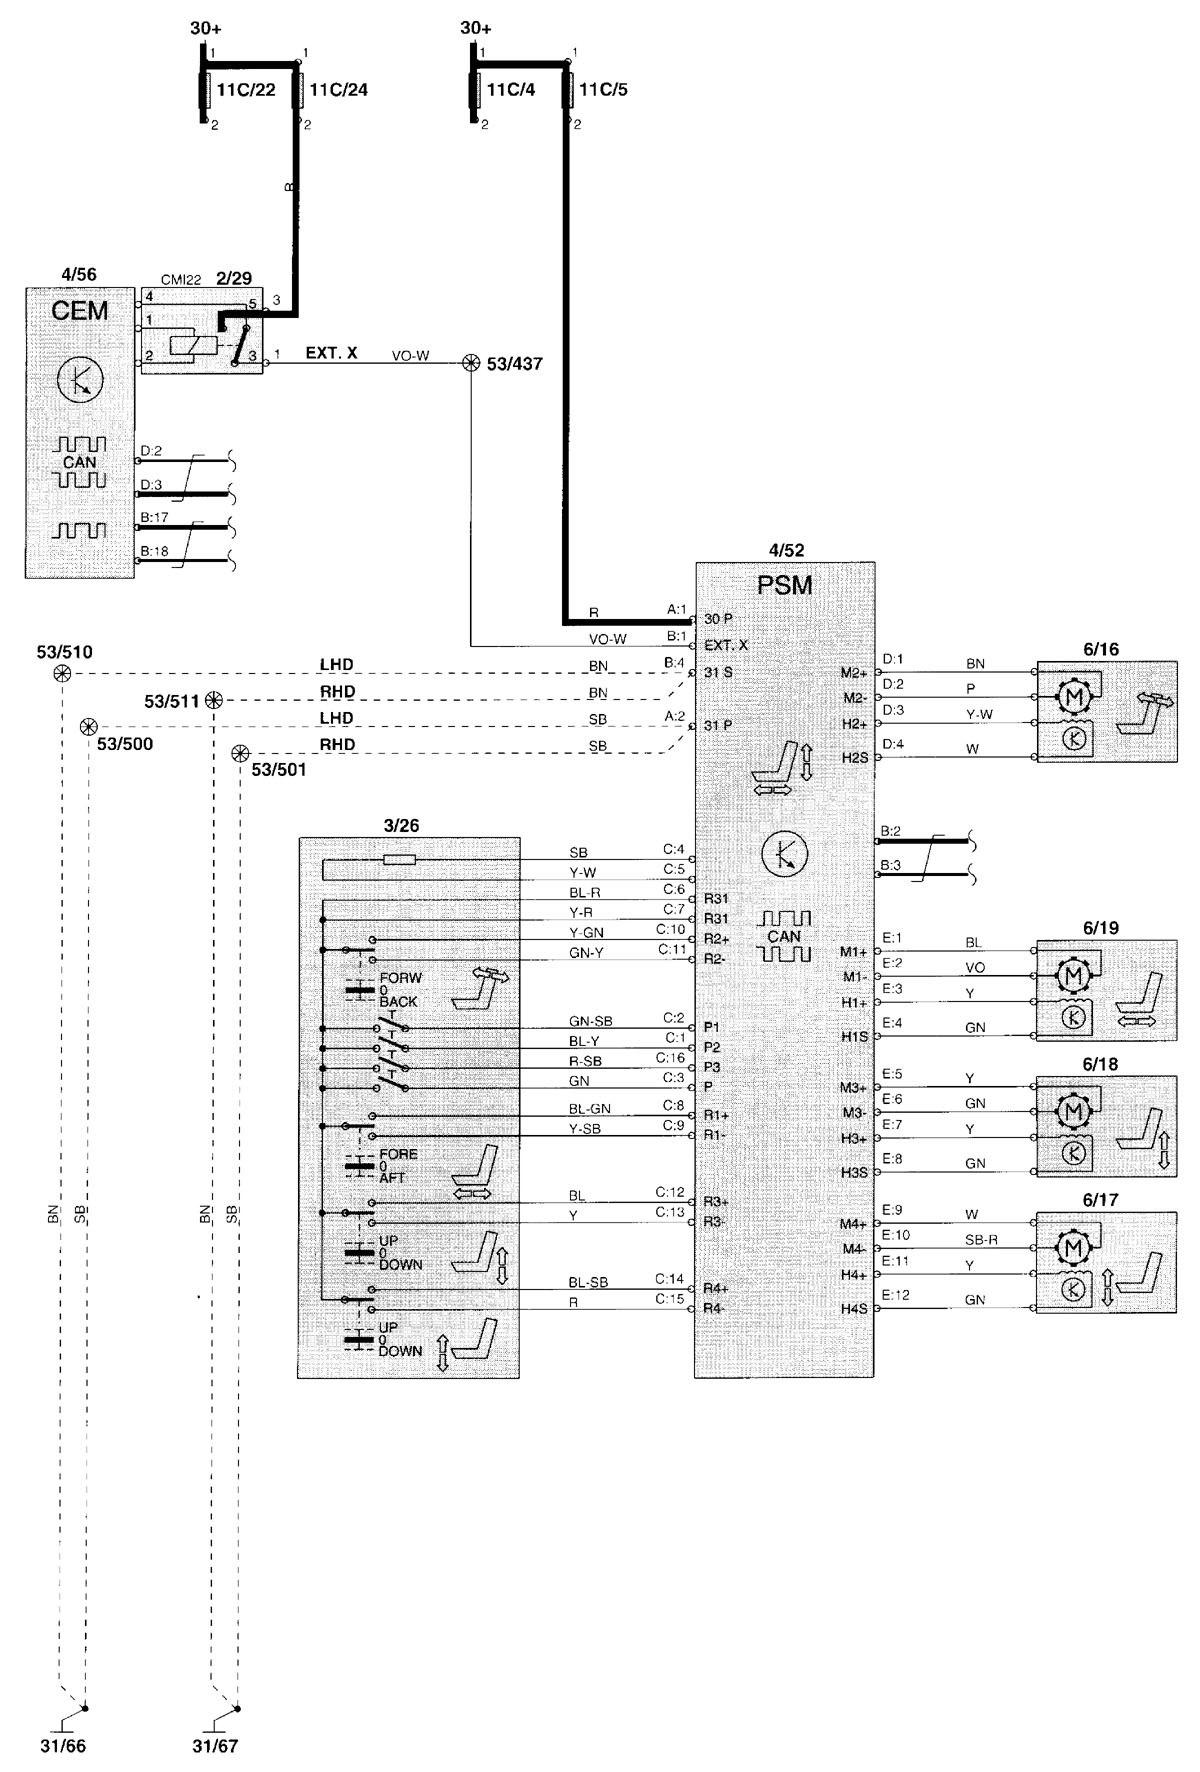 Wiring Diagram 2000 Volvo - John Deere Battery Wiring Diagram -  impalafuse.tukune.jeanjaures37.fr | Volvo S70 Wiring Diagram Pdf |  | Wiring Diagram Resource